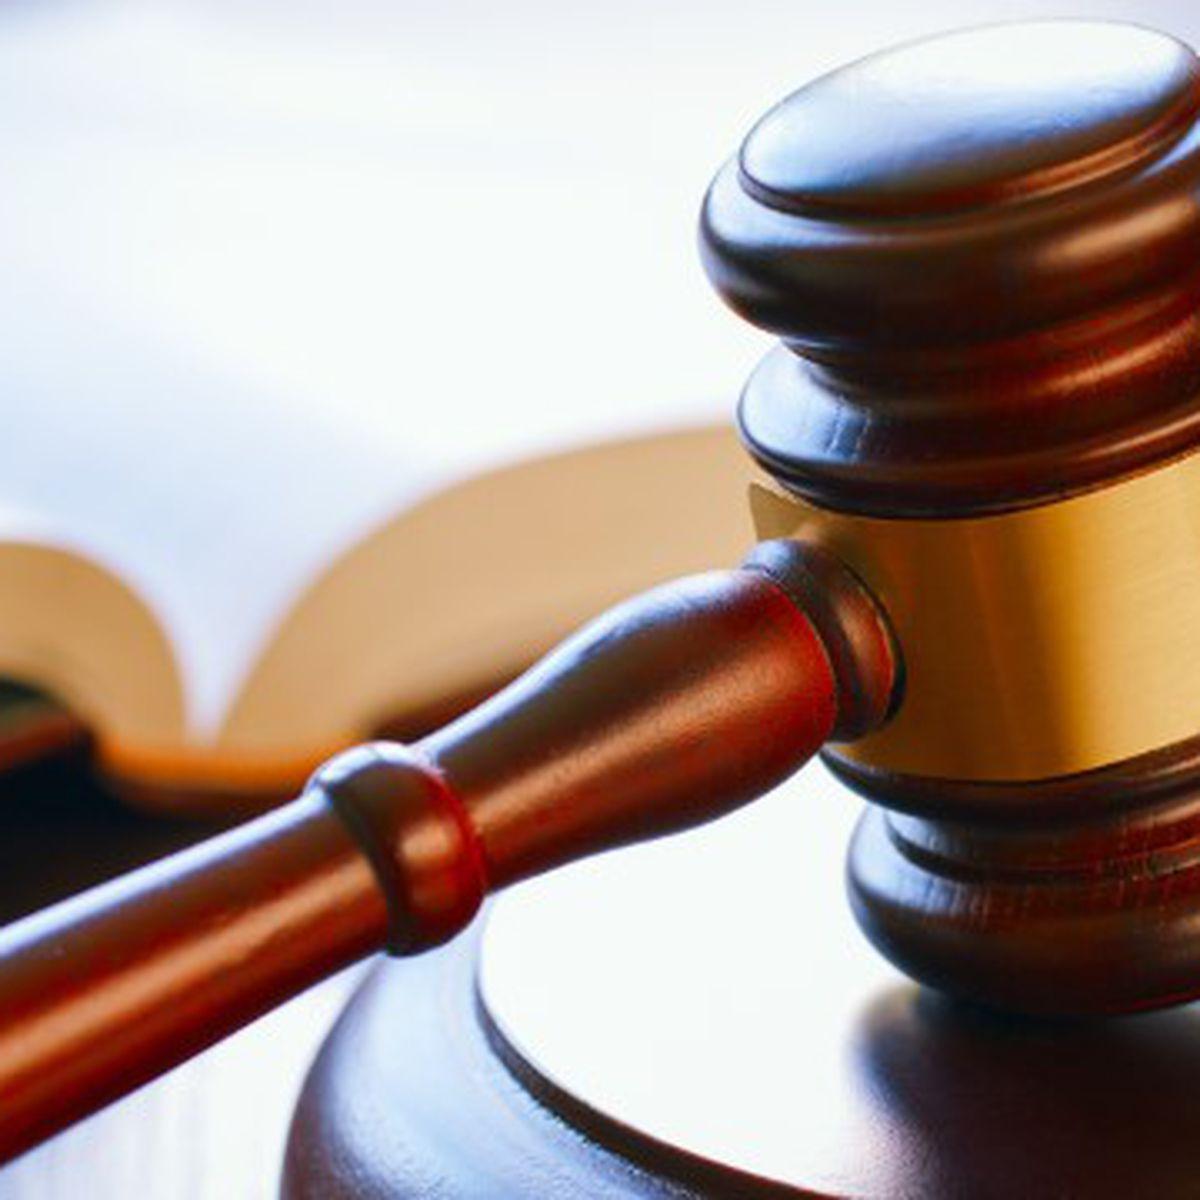 Former Palestine football player sentenced in assault case